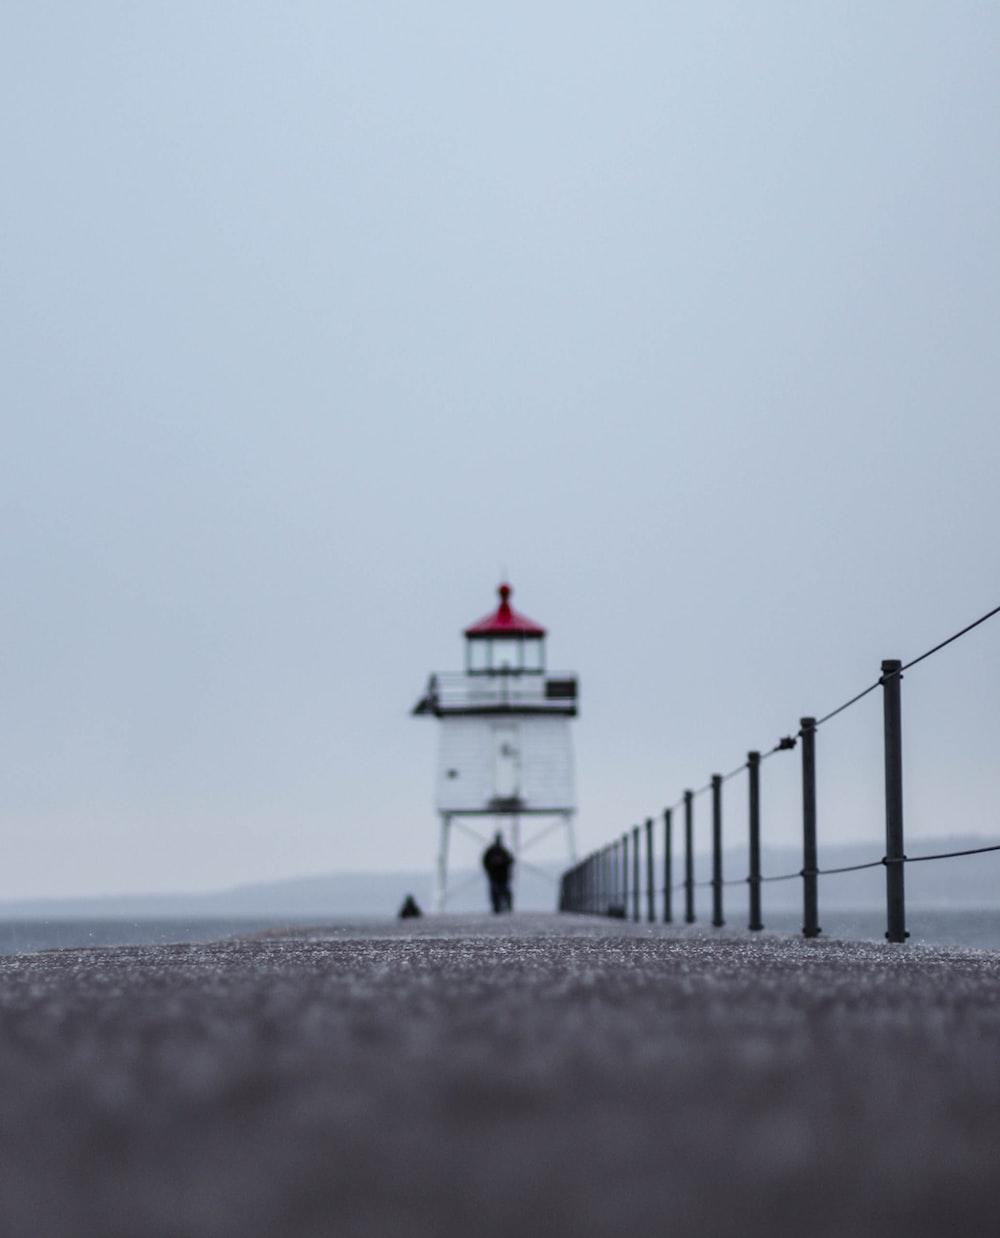 white lighthouse under gray sky during daytime